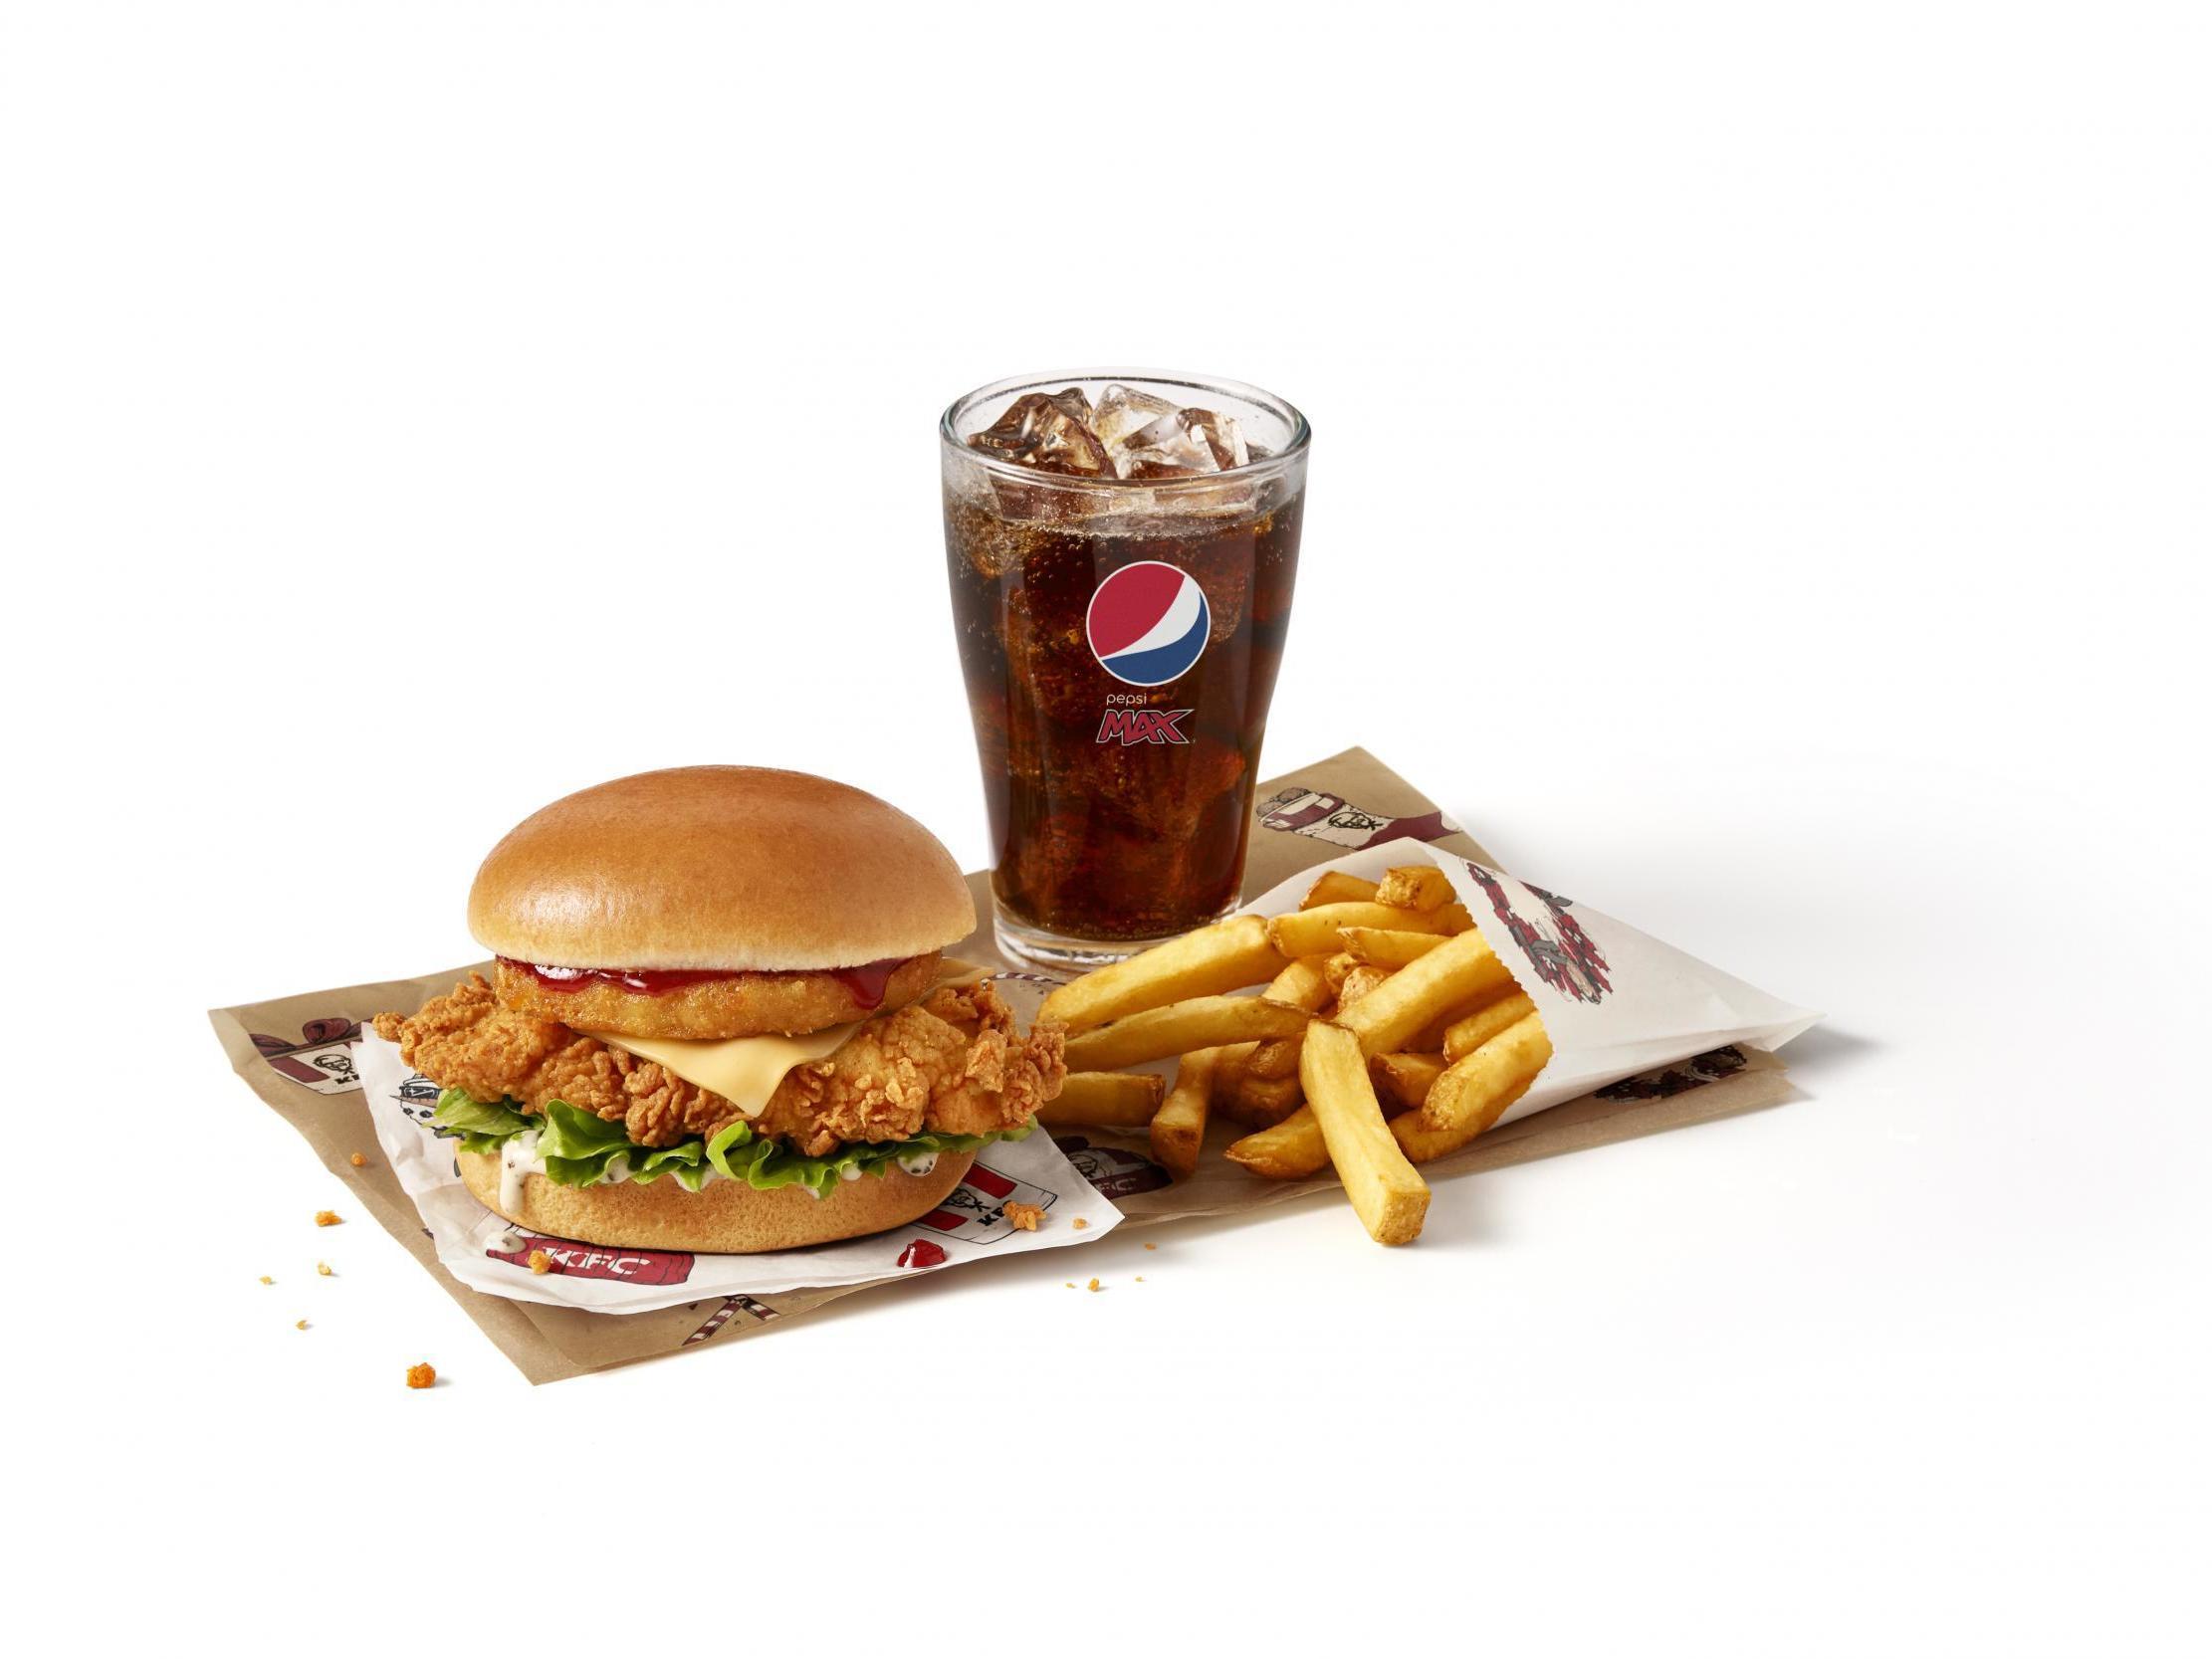 KFC launch seasonal Christmas dinner box including stuffing mayonnaise